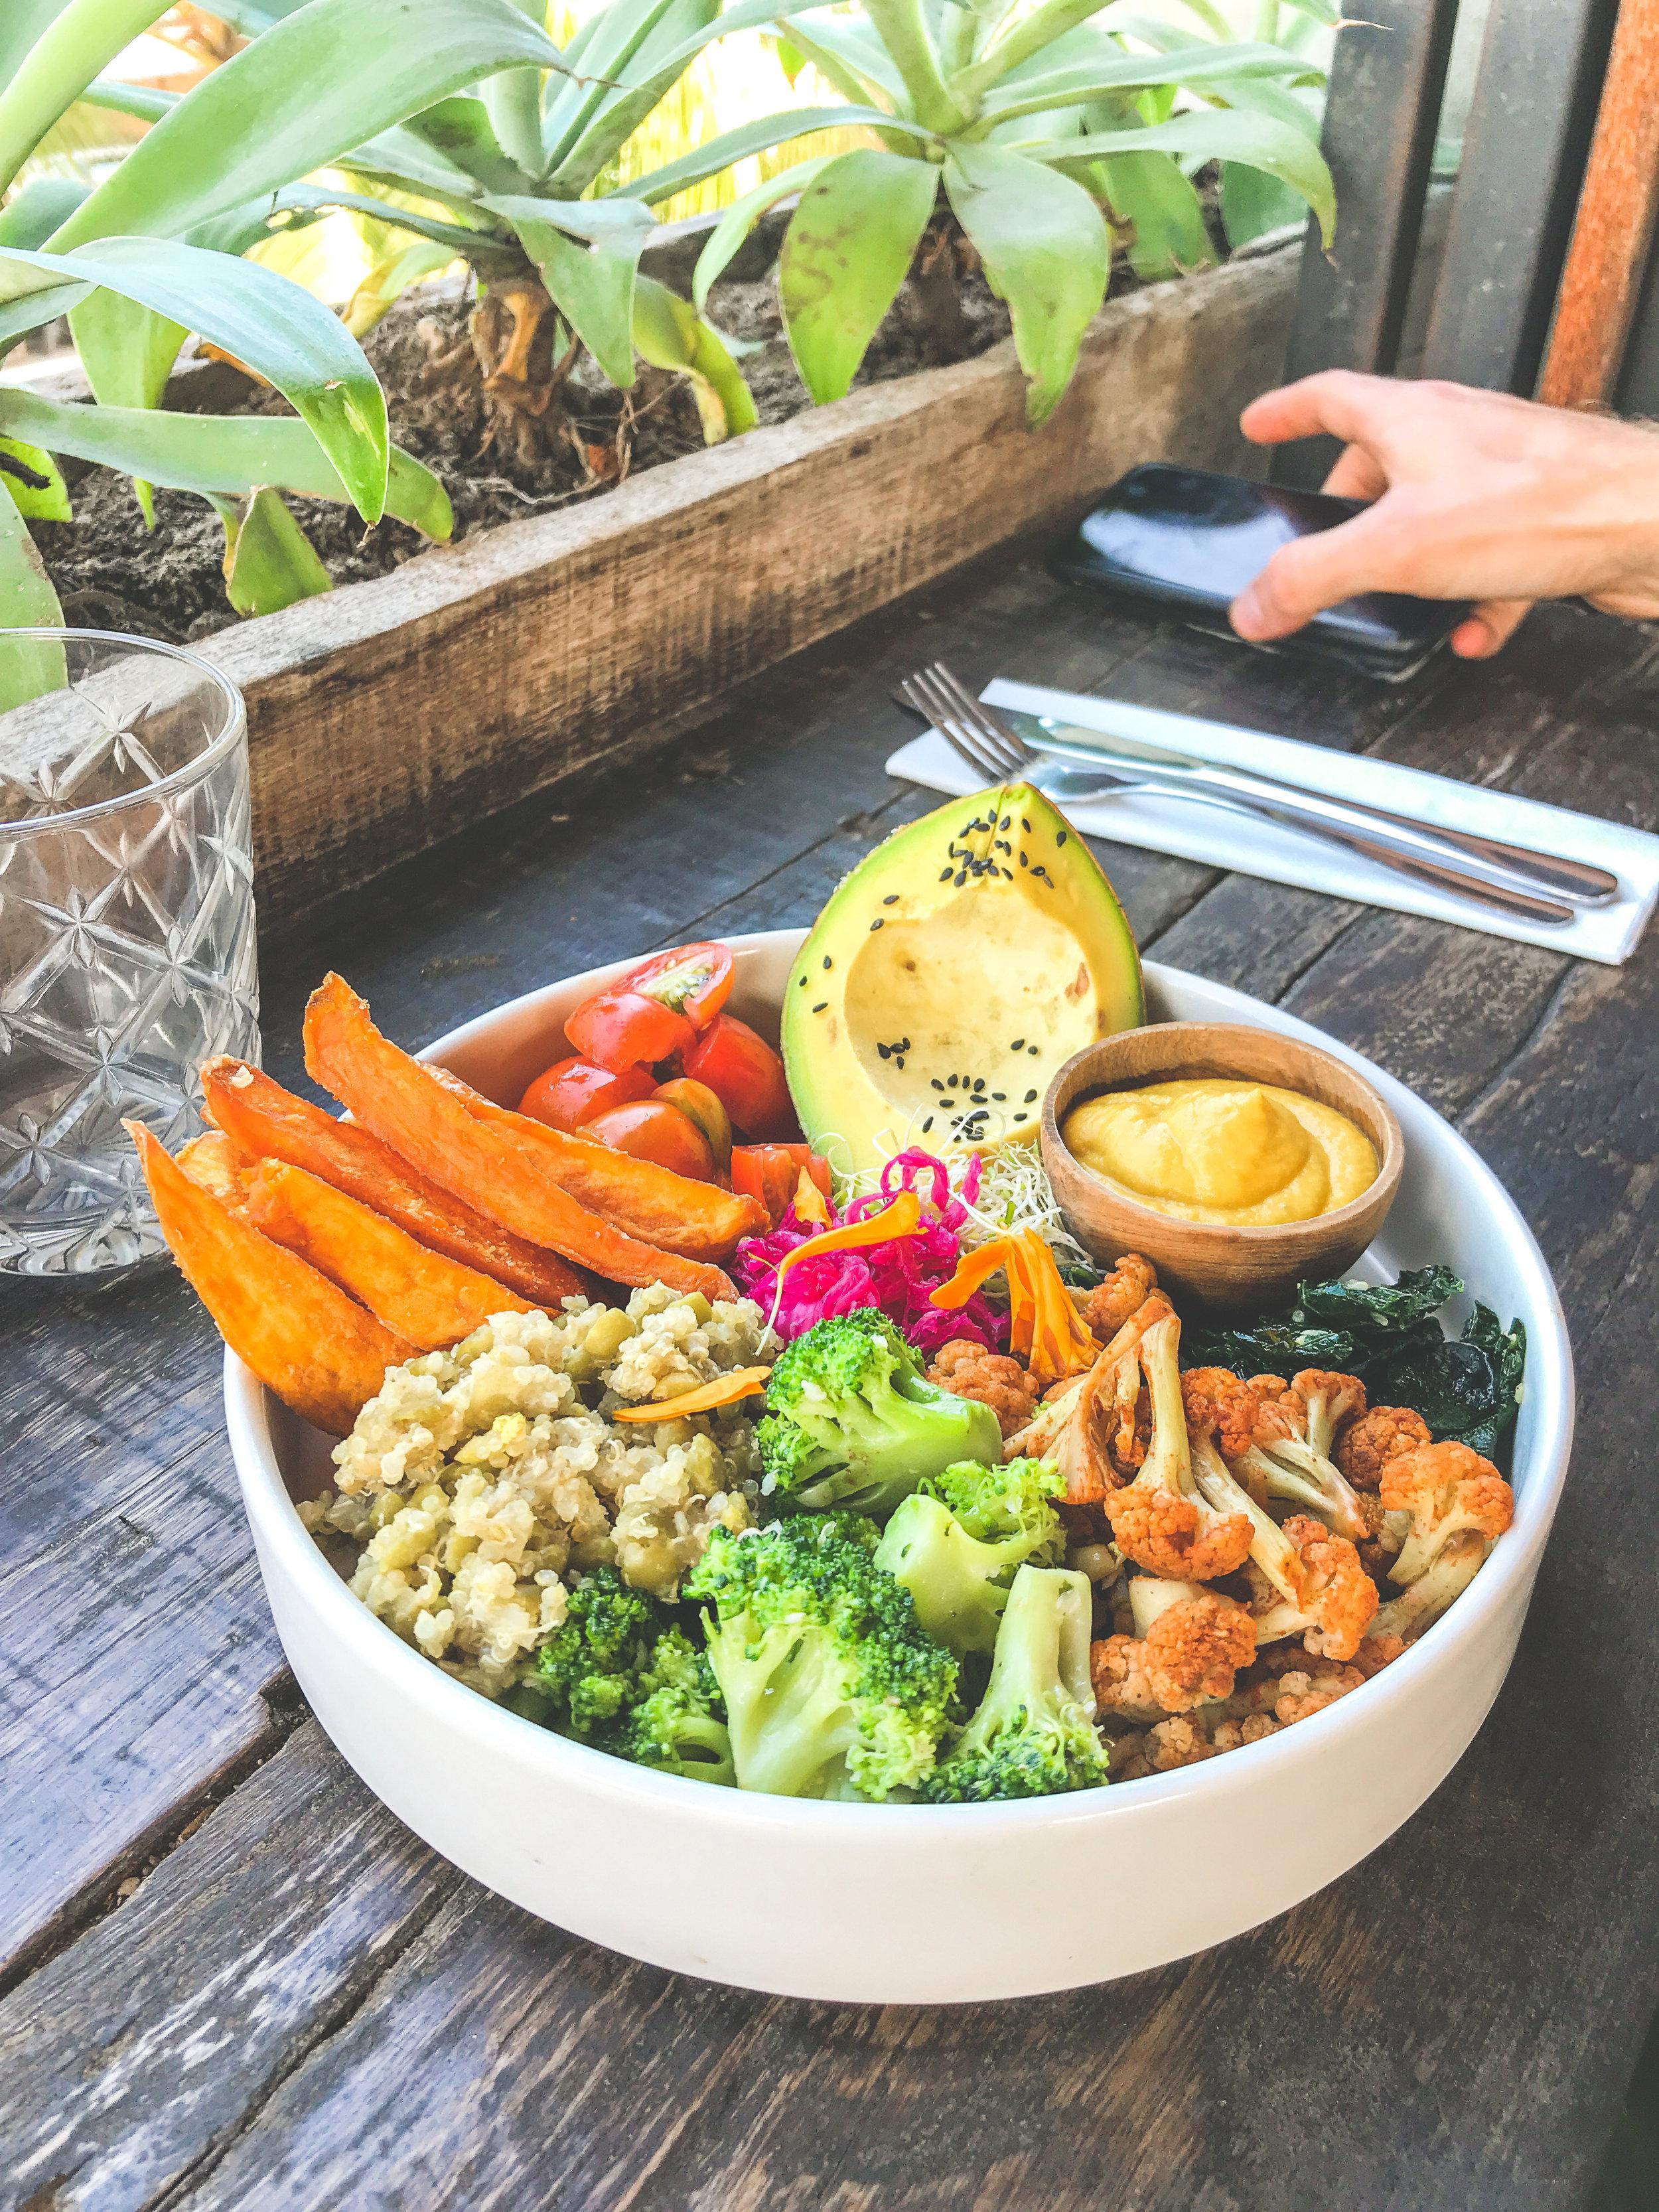 11 Best Vegan Cafes and Restaurants in Bali